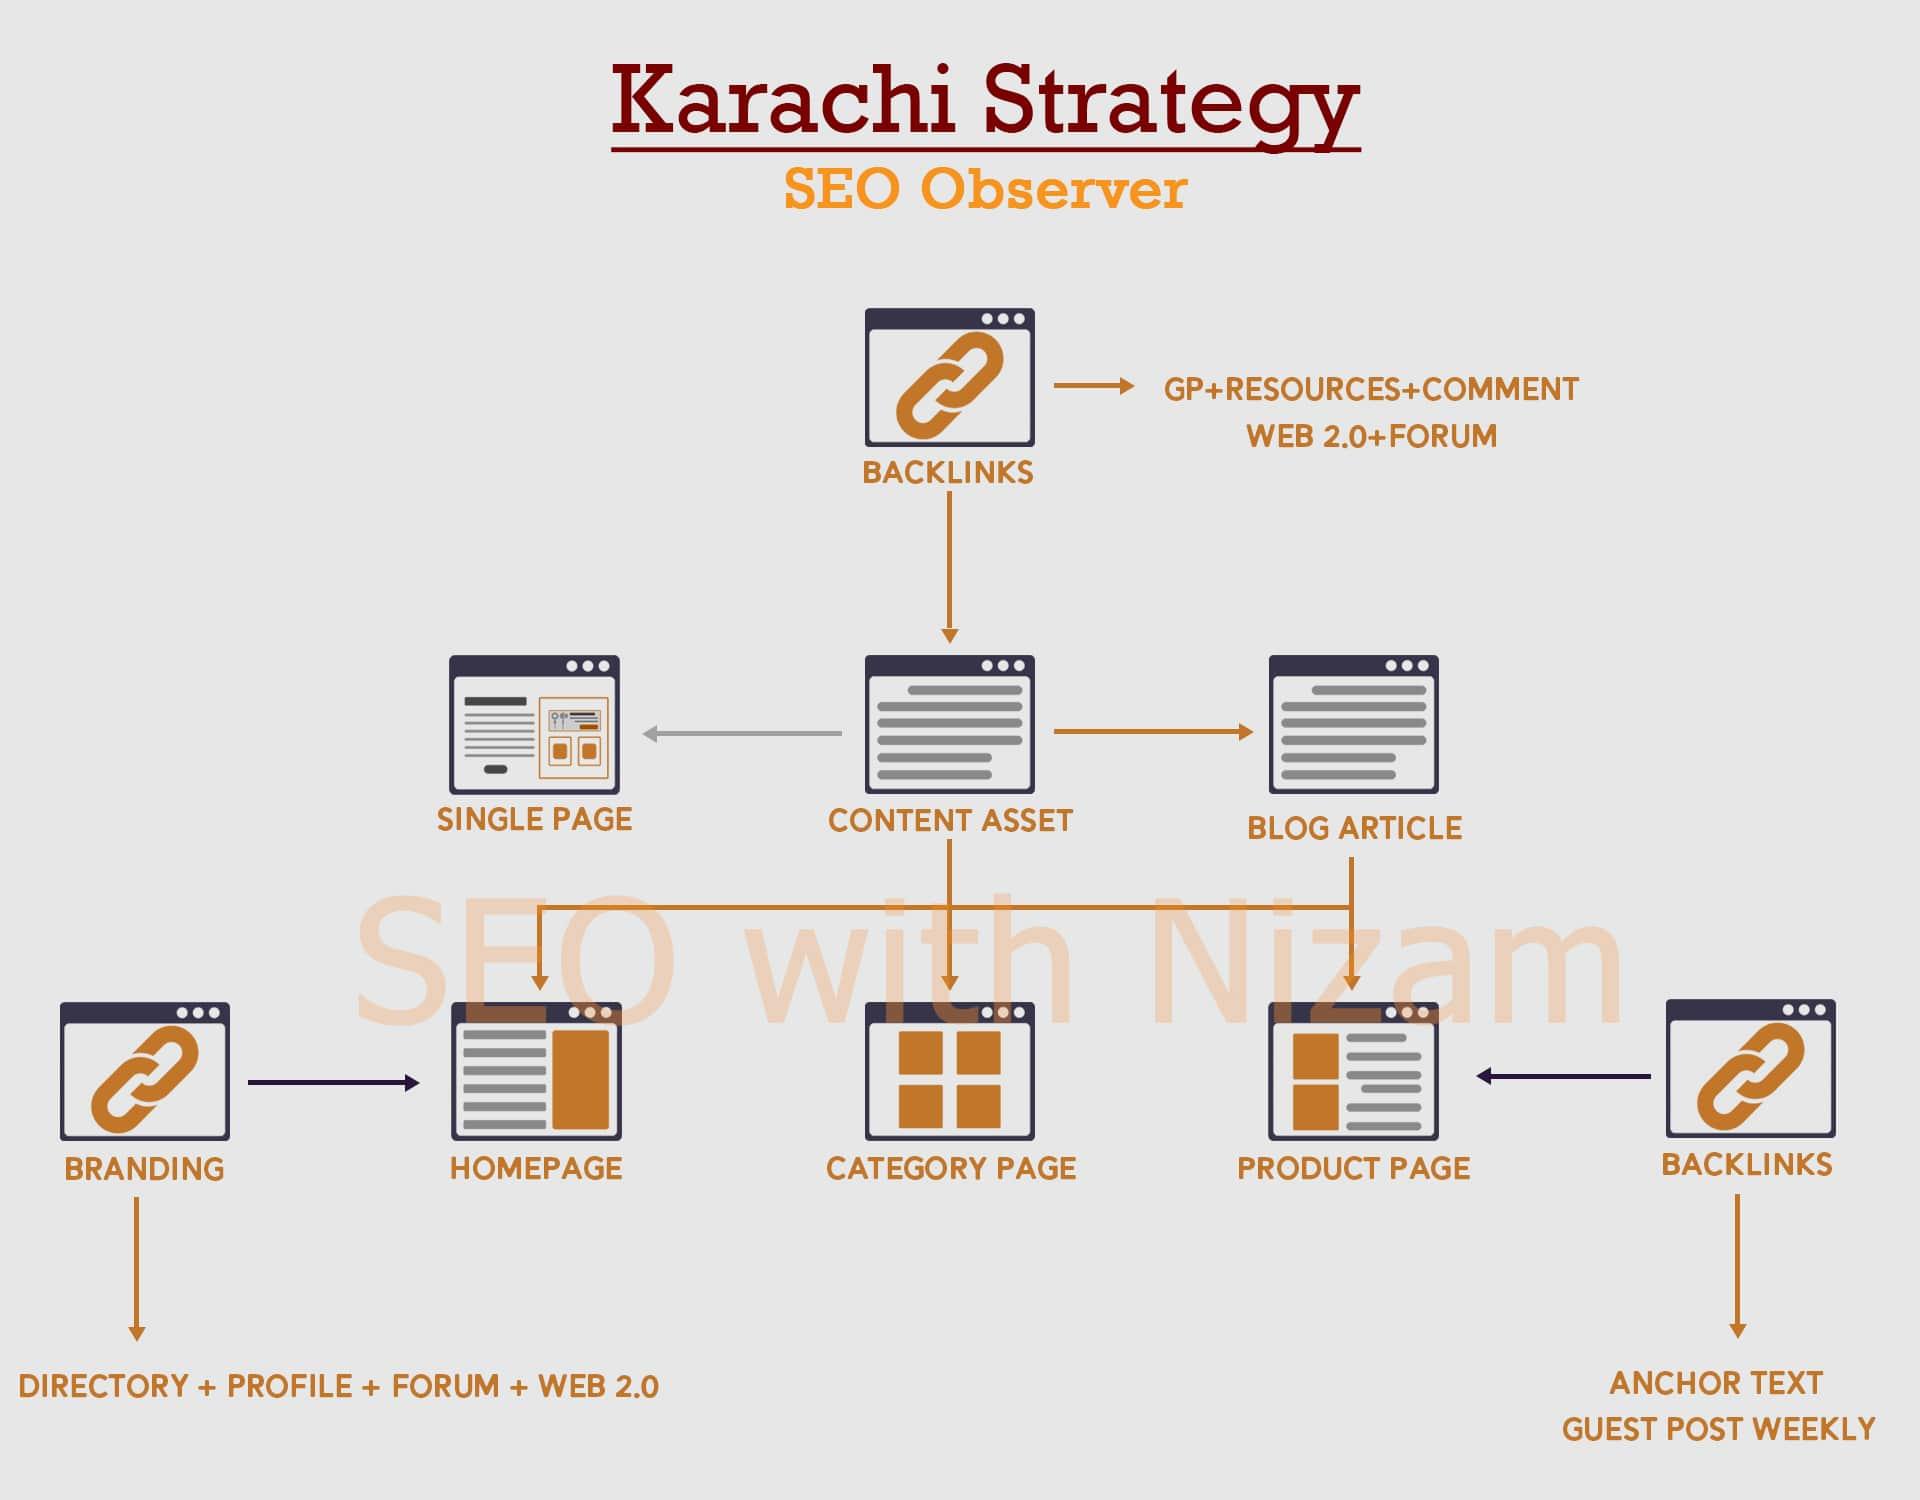 Karachi Strategy